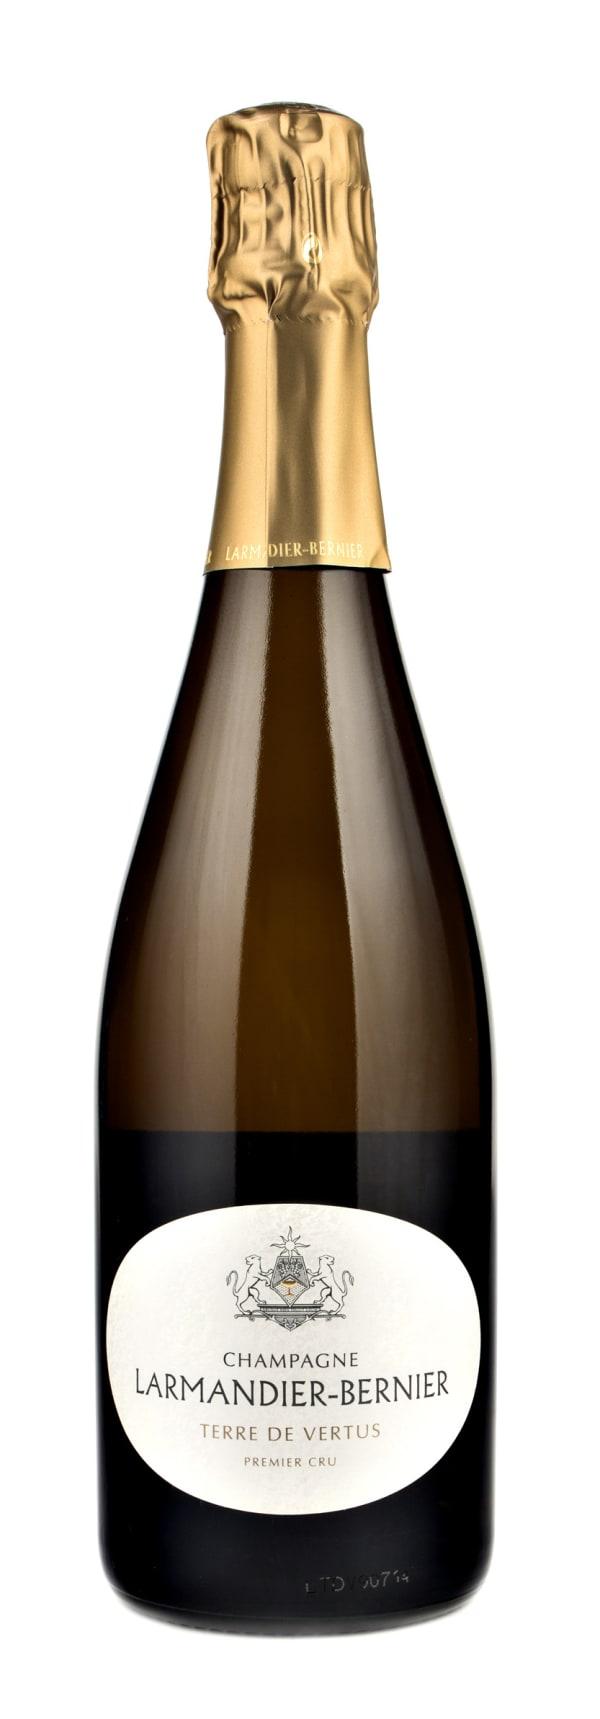 Larmandier-Bernier Terre de Vertus Premier Cru Champagne Brut 2010